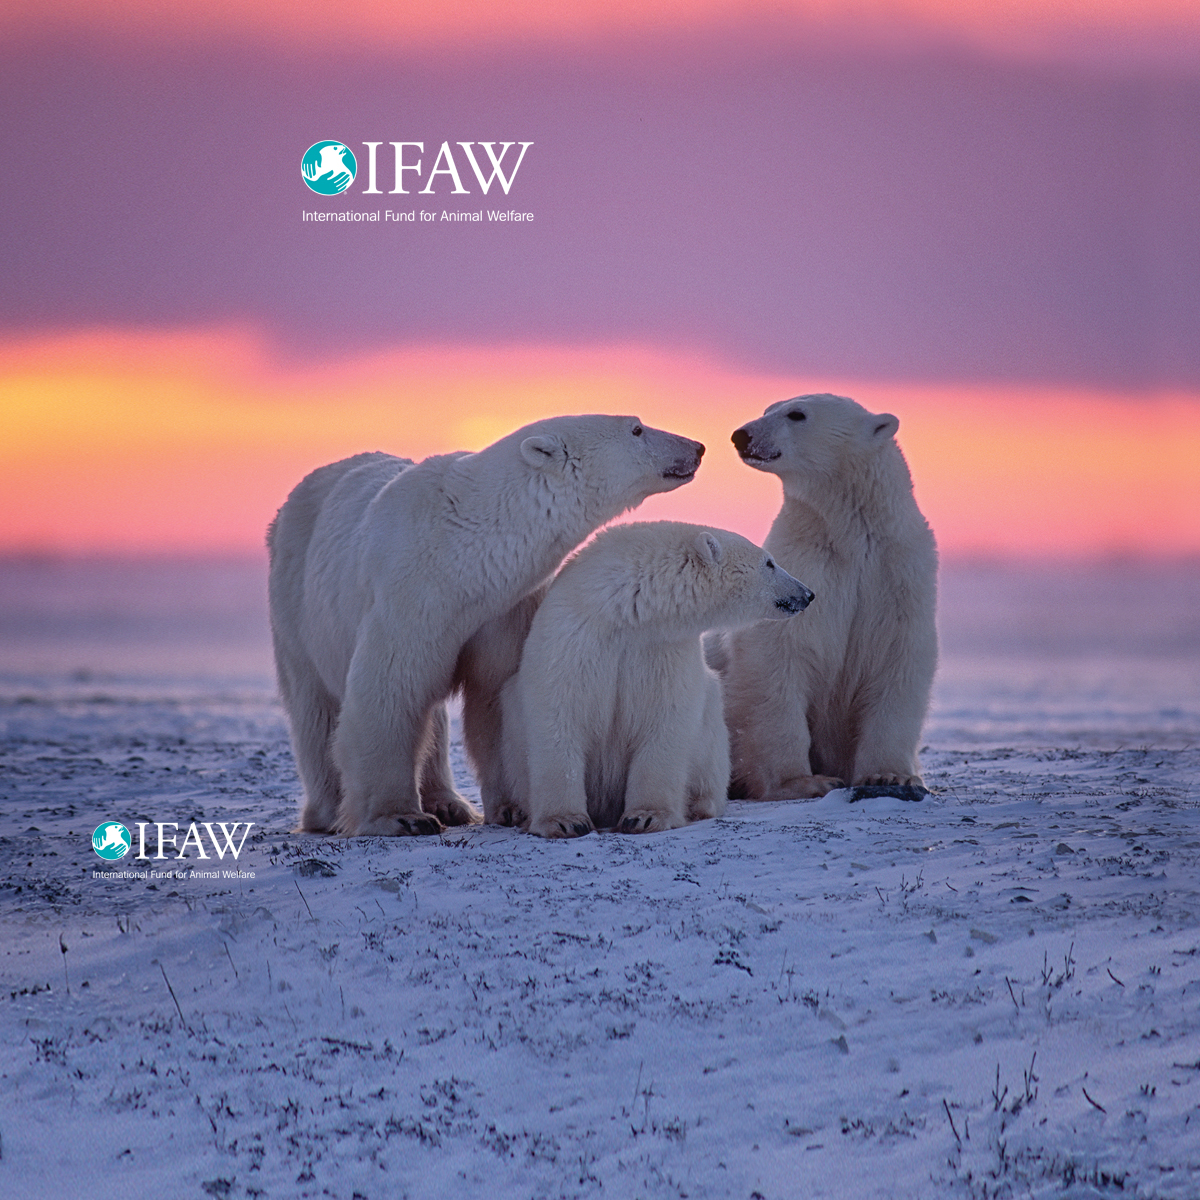 Polar Bear Wallpaper Ifaw International Fund For Animal Welfare